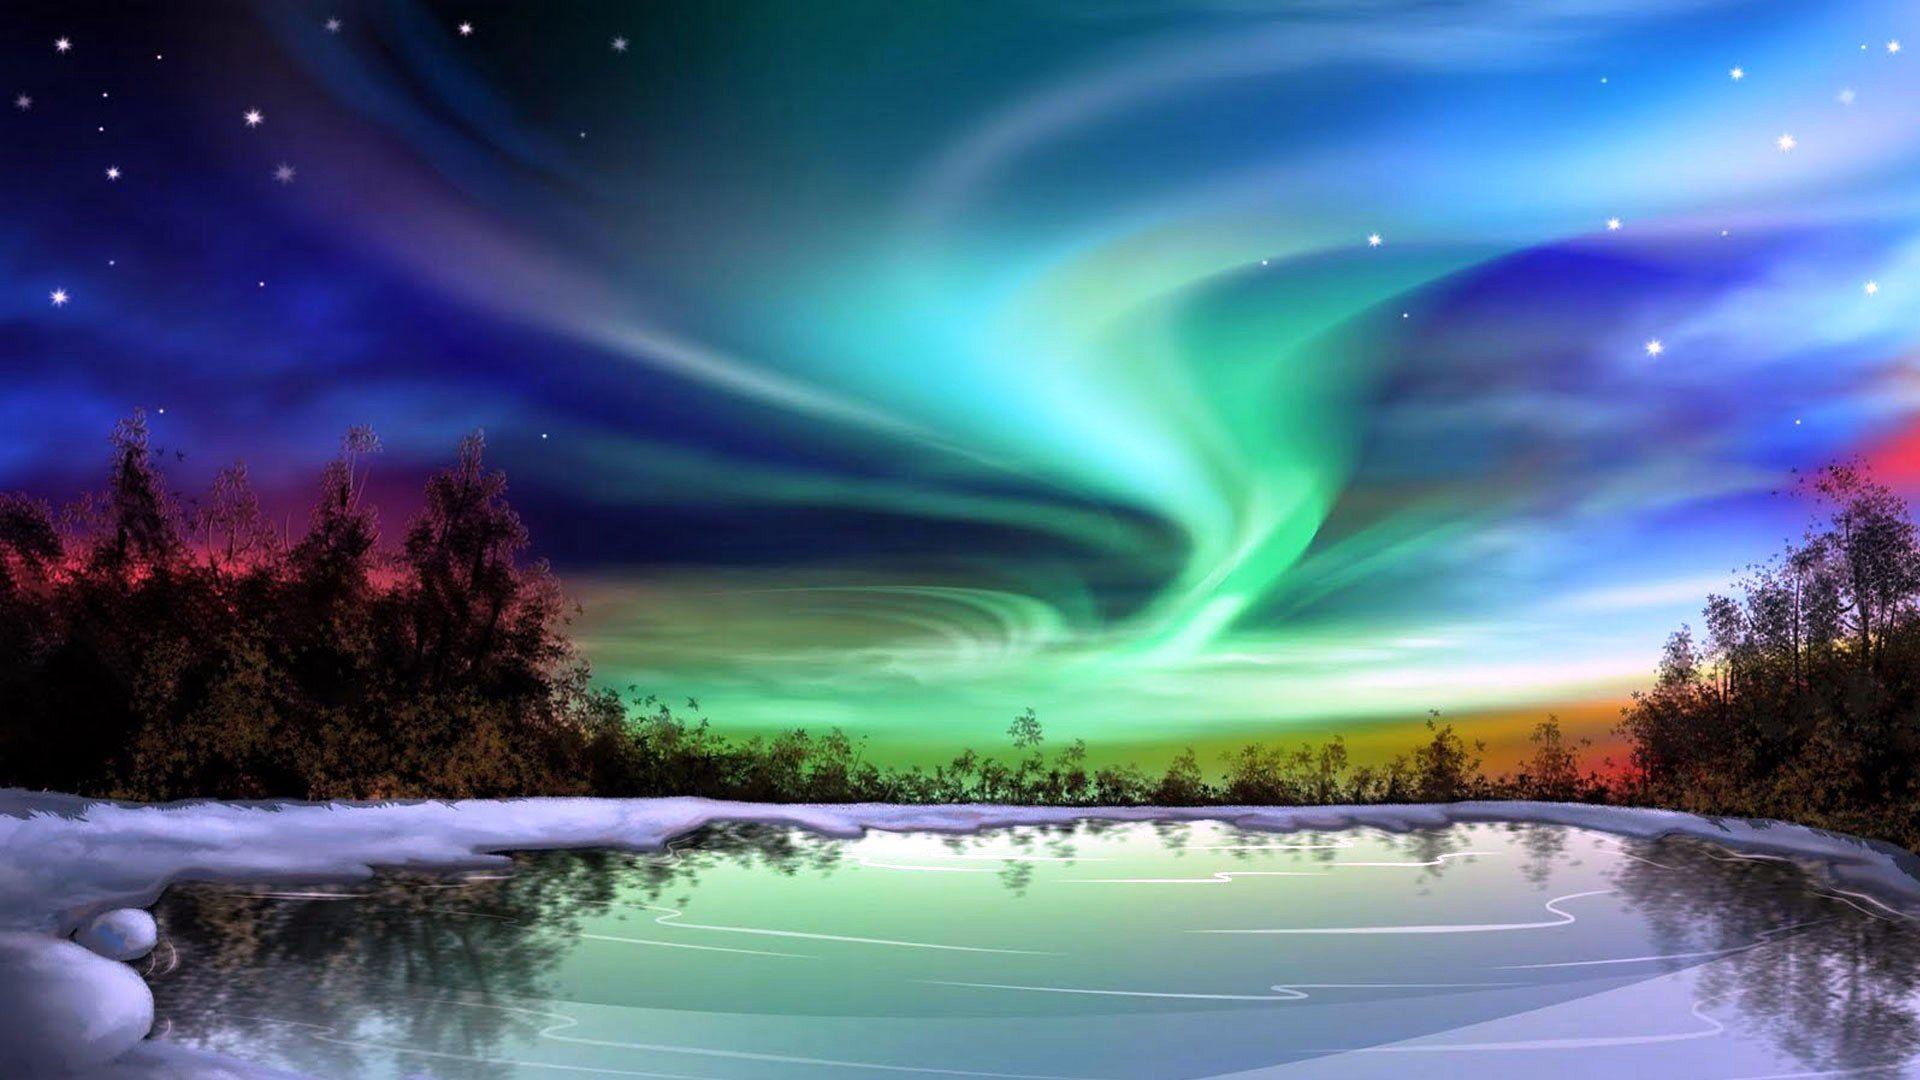 Northern lights on snow full hd fond d 39 cran and arri re for Aurora boreale sfondo